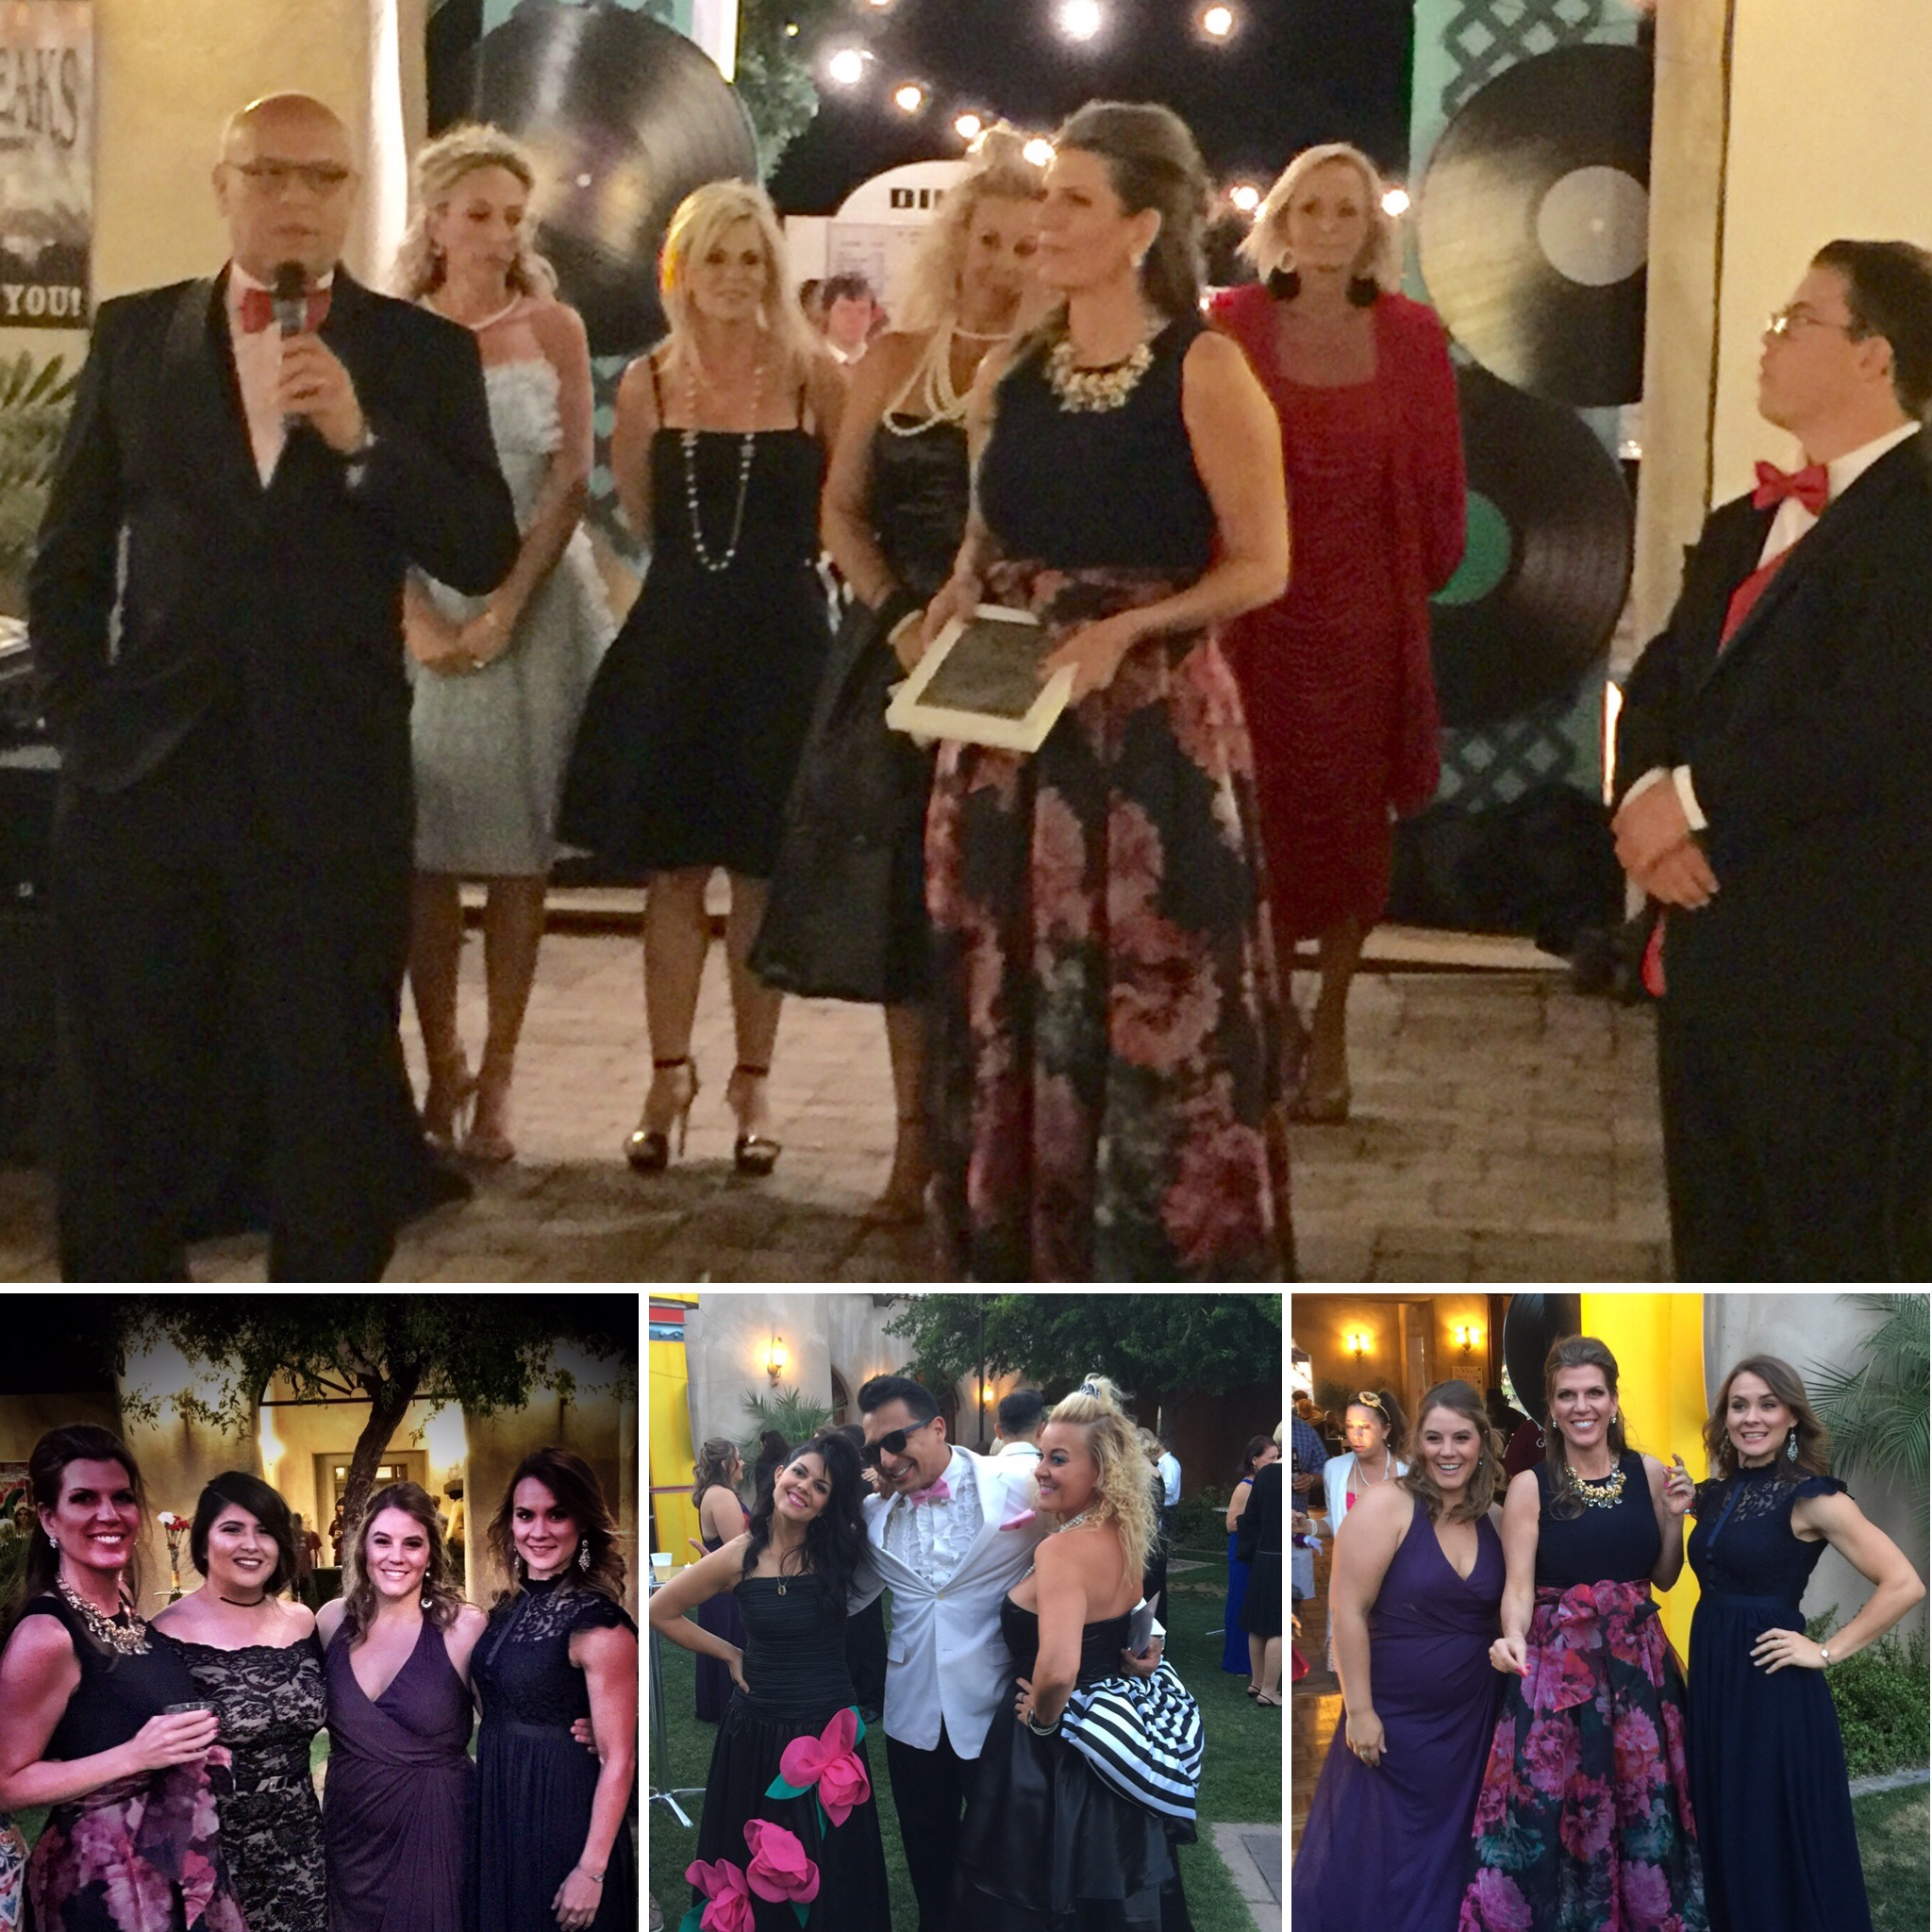 Pics from Gigi's Gala